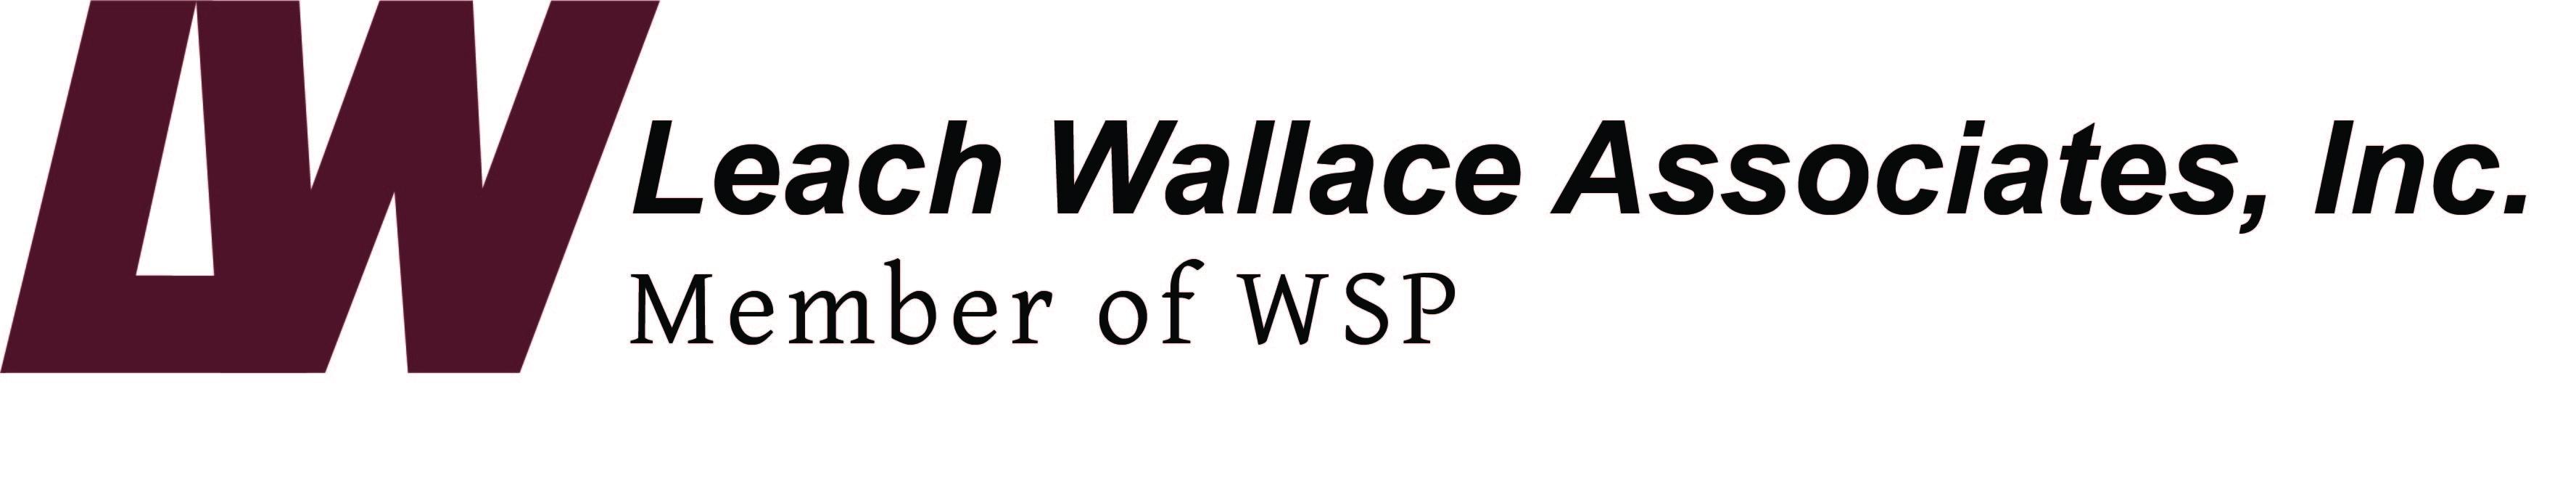 Leach Wallace w WSP logo bold Flush Left